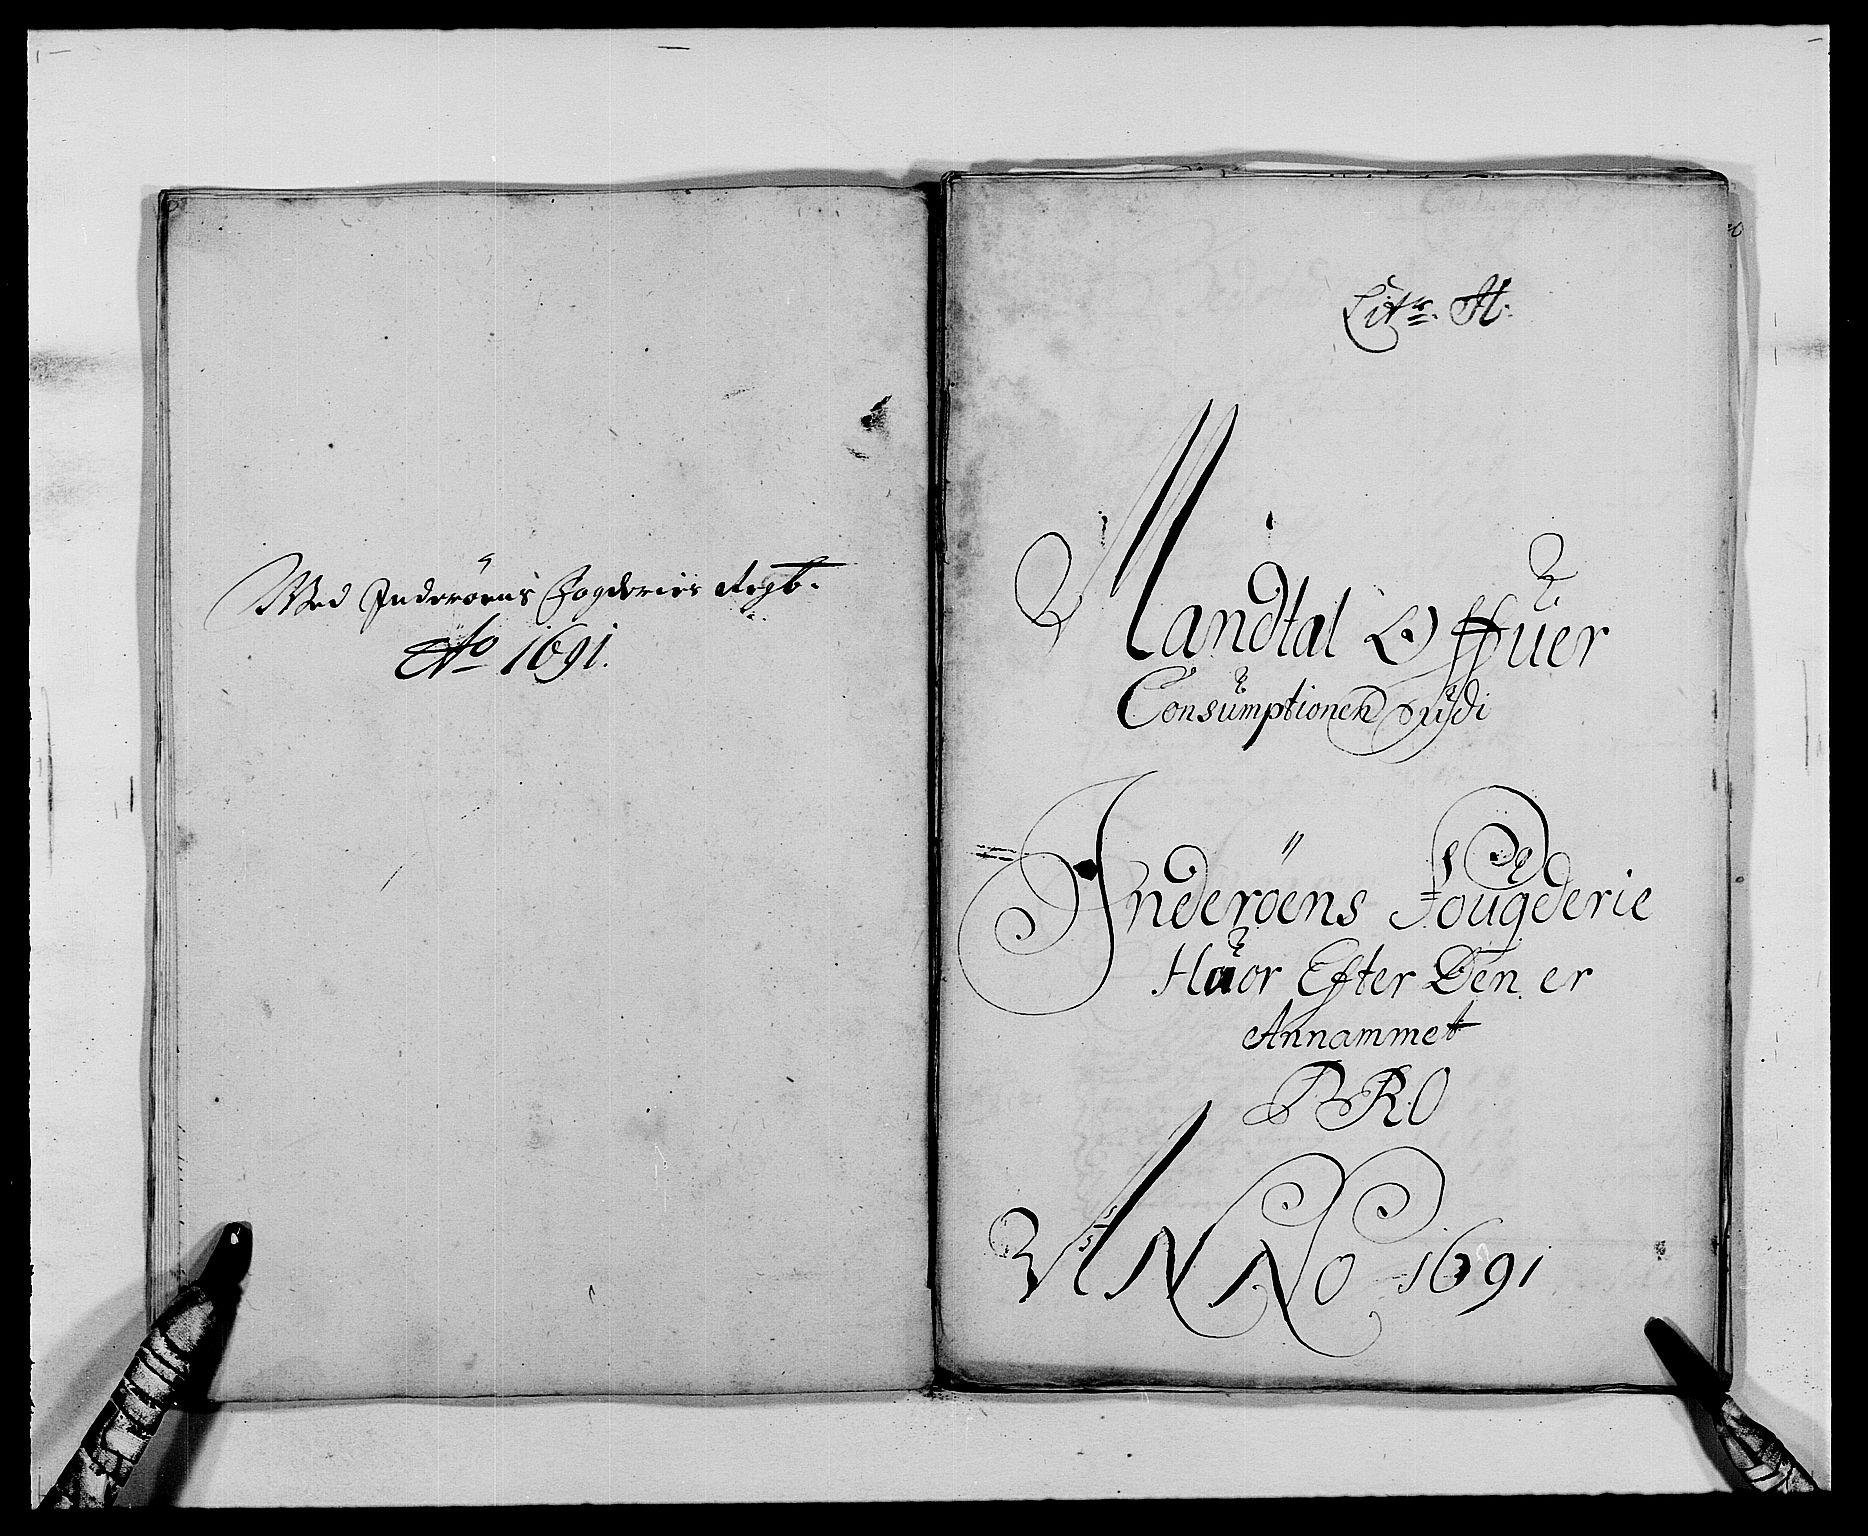 RA, Rentekammeret inntil 1814, Reviderte regnskaper, Fogderegnskap, R63/L4307: Fogderegnskap Inderøy, 1690-1691, s. 334